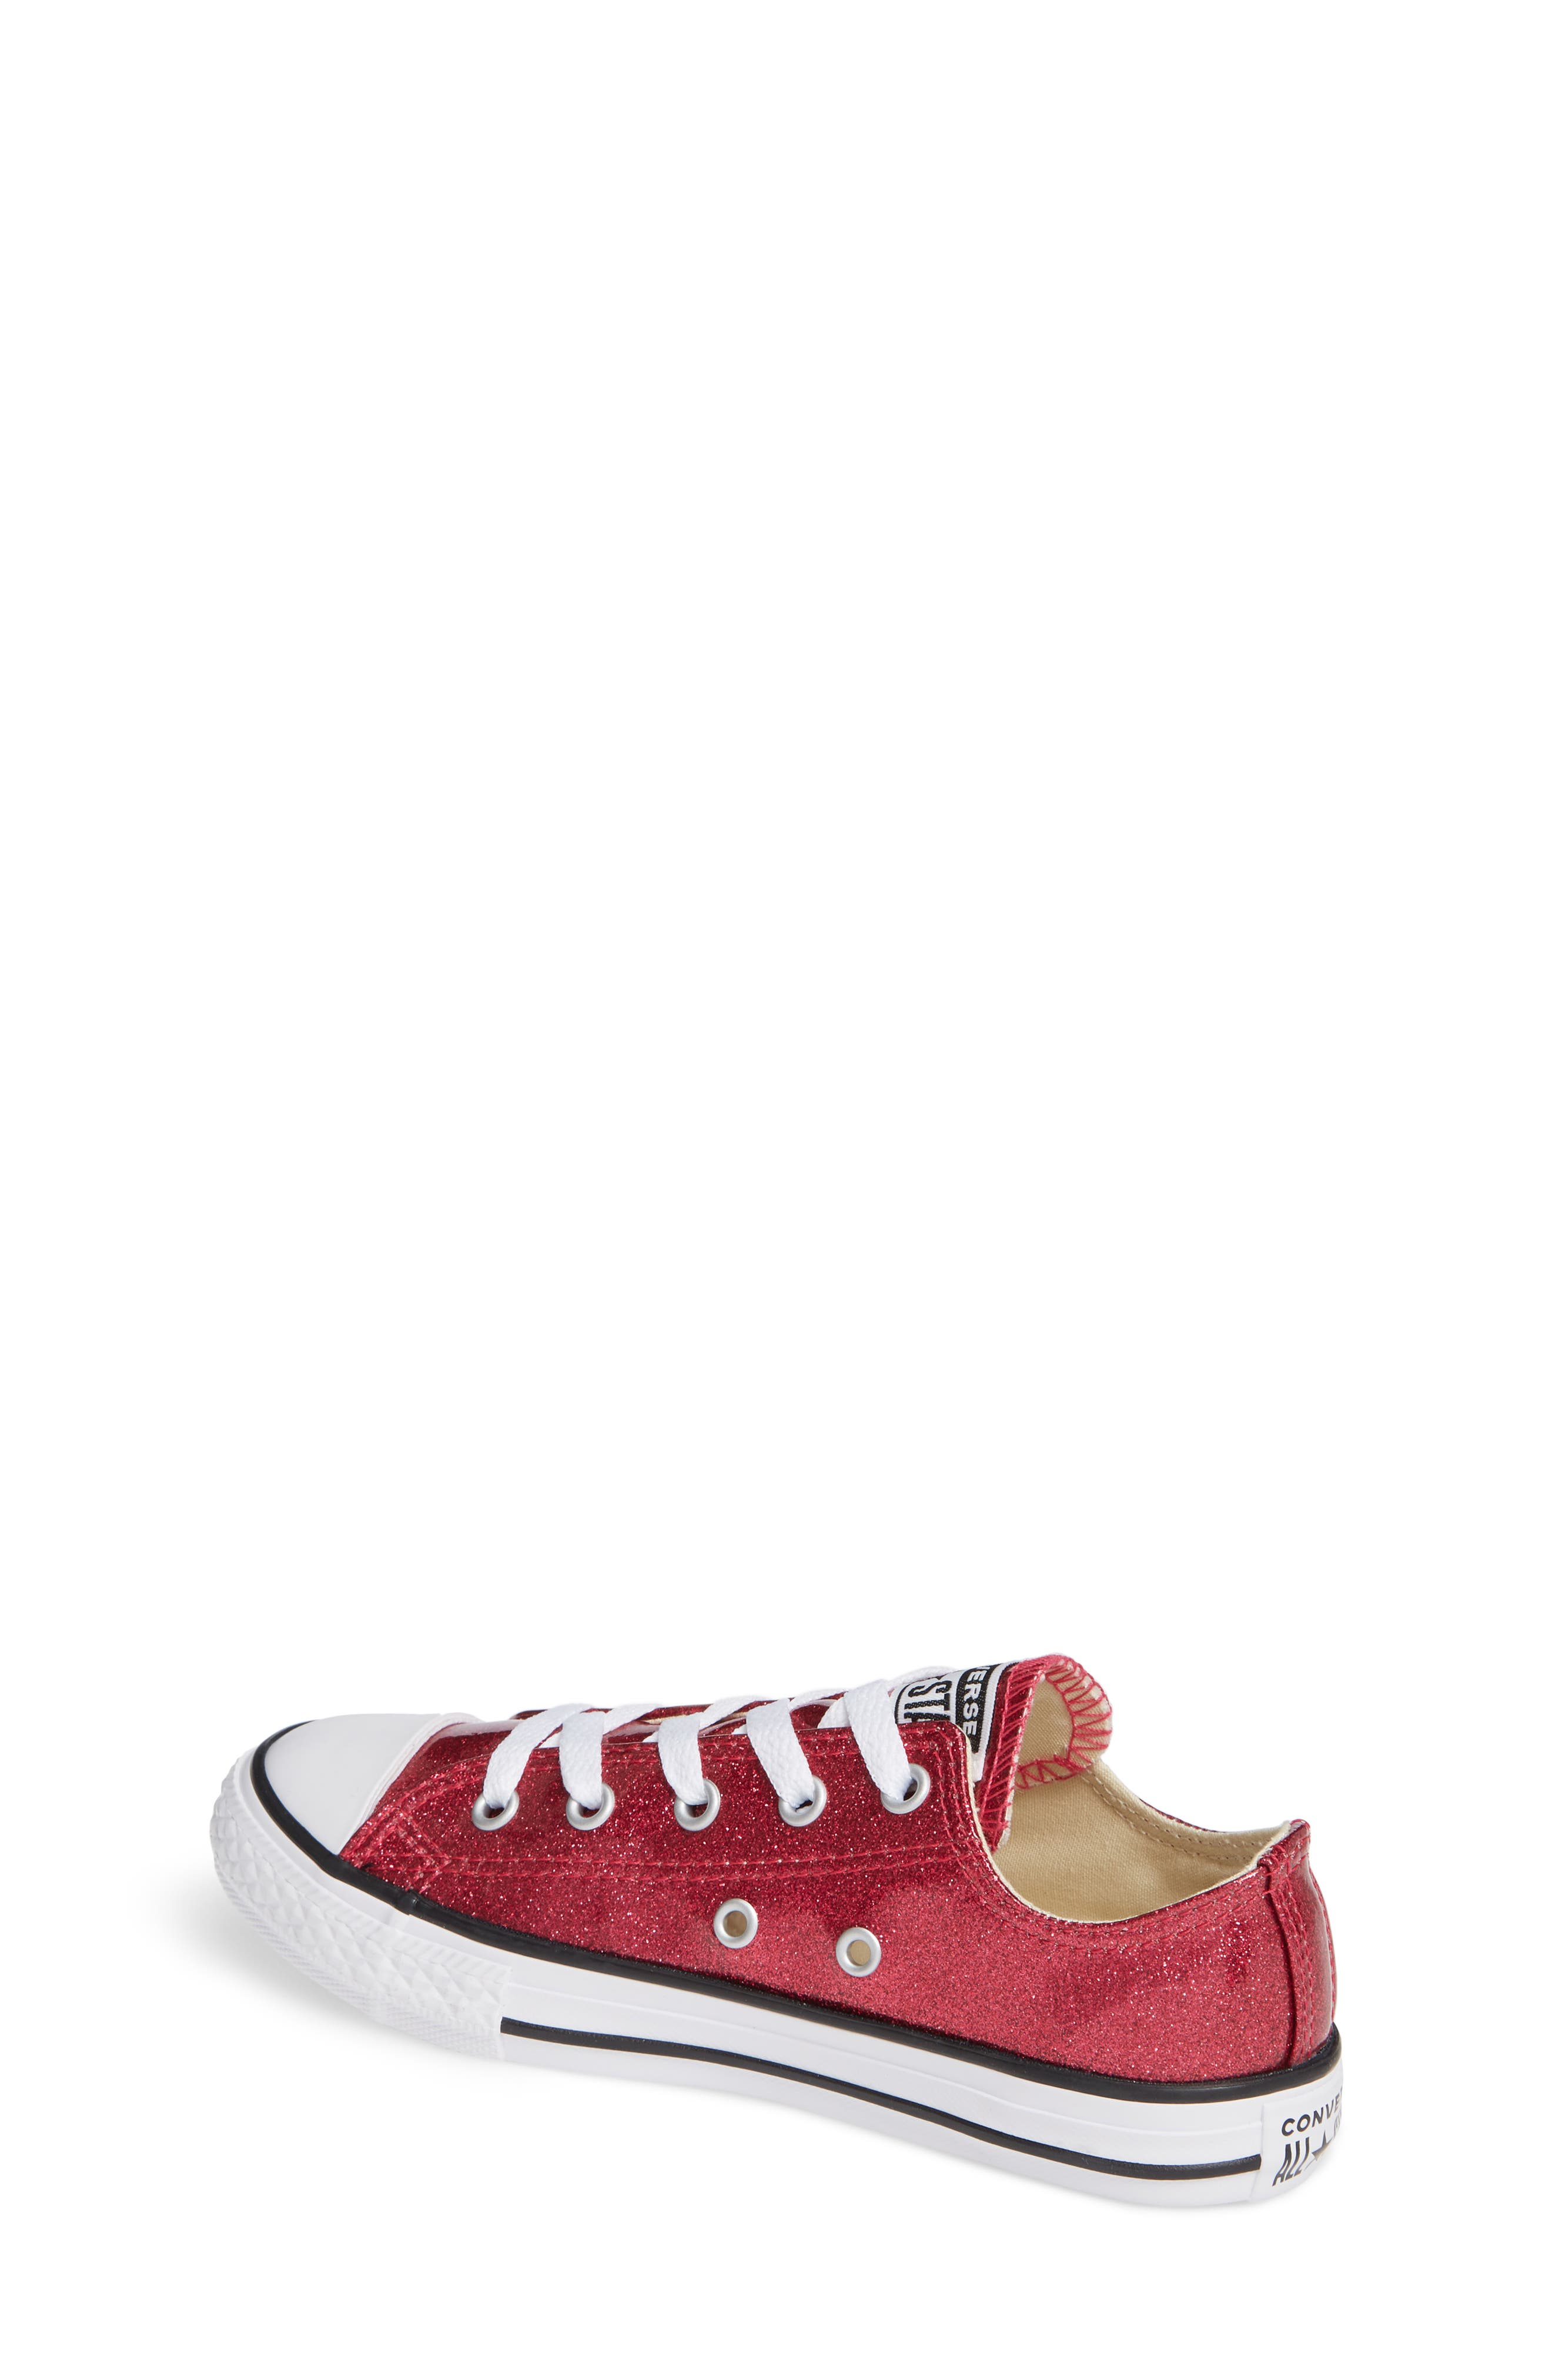 All Star<sup>®</sup> Seasonal Glitter OX Low Top Sneaker,                             Alternate thumbnail 2, color,                             PINK POP